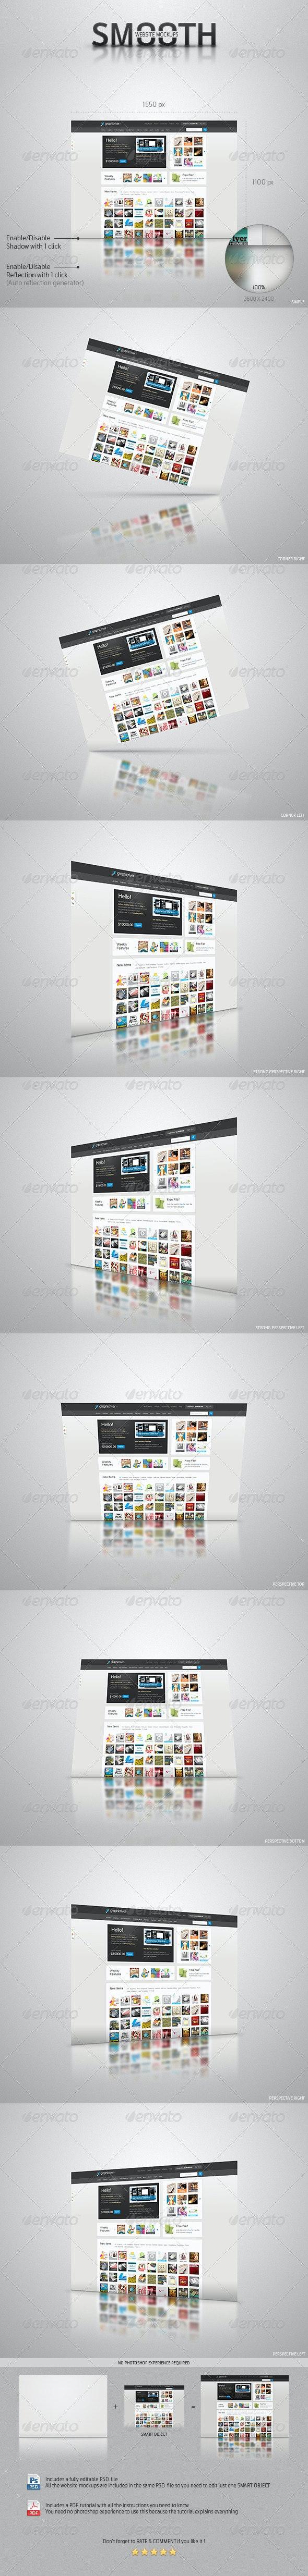 Smooth Website Mockups - Website Displays